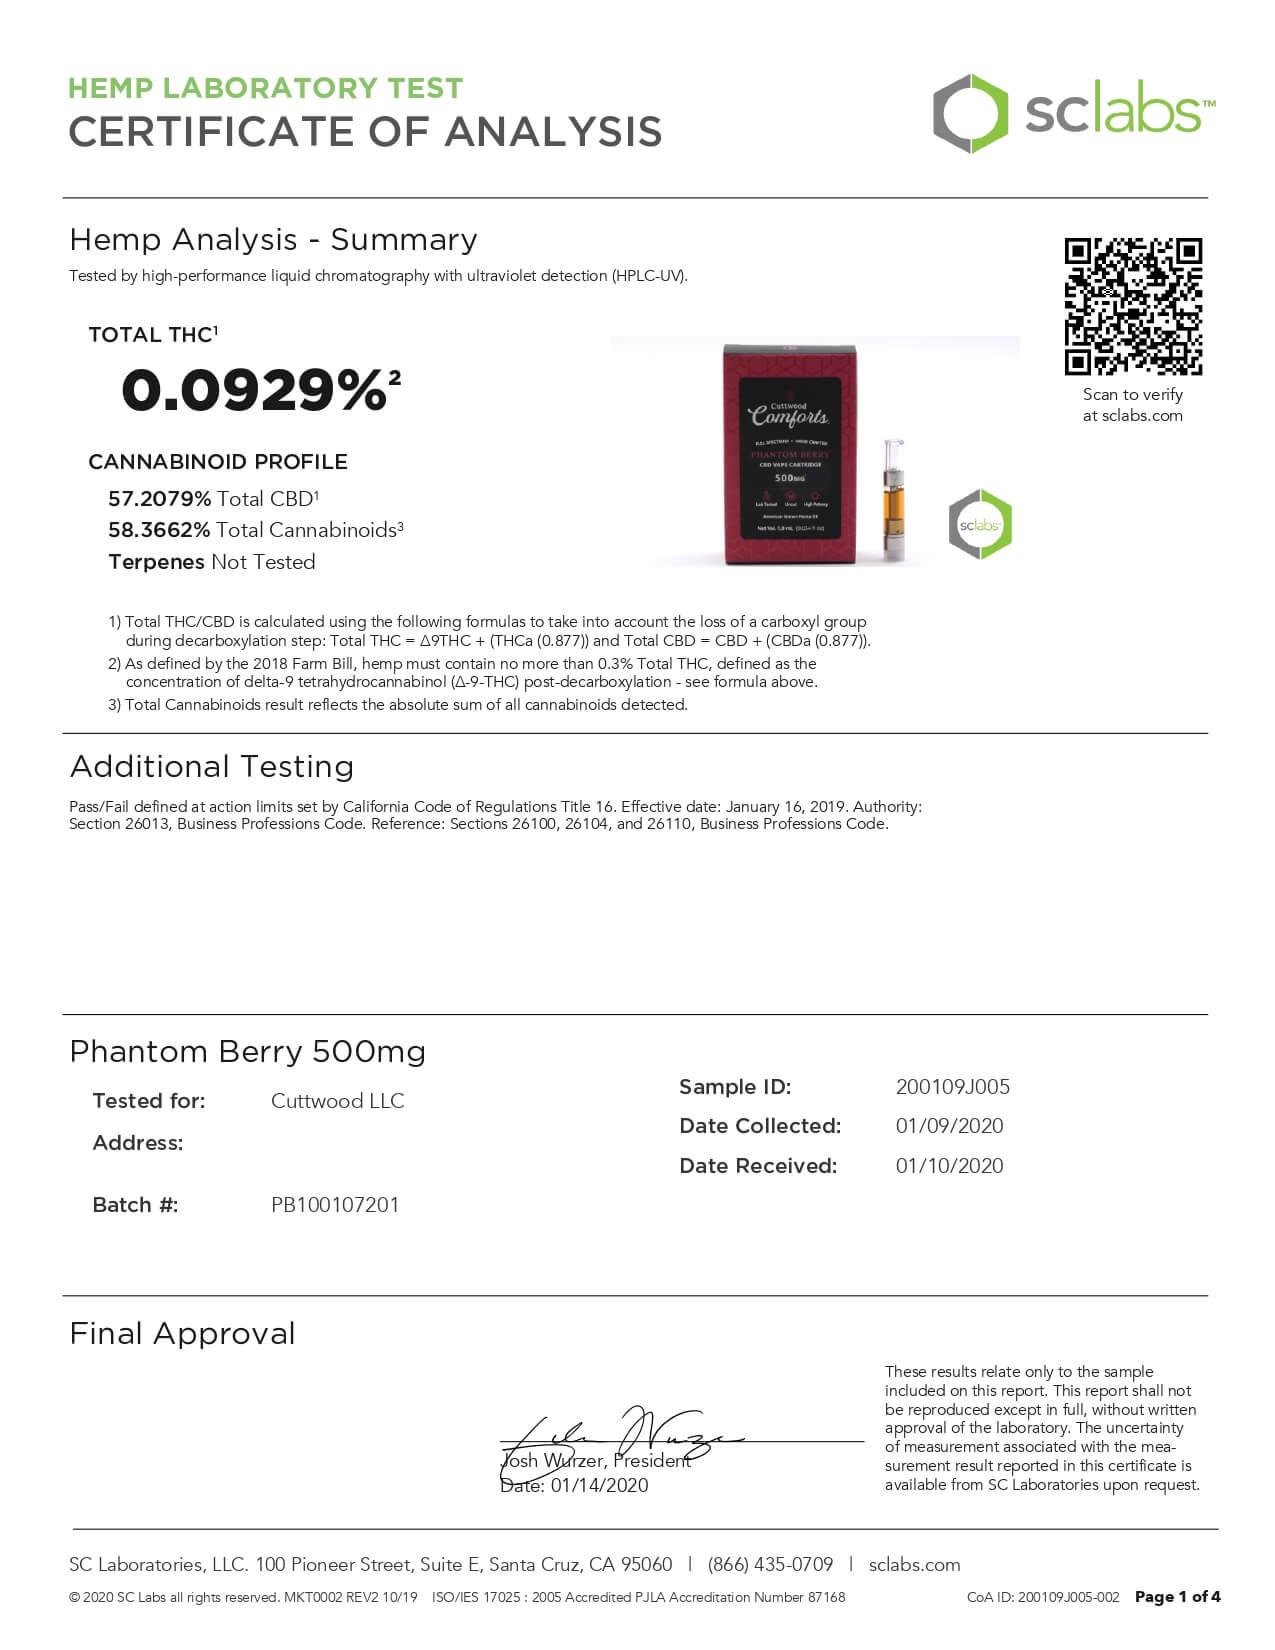 Cuttwood Comforts CBD Vape Cartridge Full Spectrum Phantom Berry 500mg Lab Report